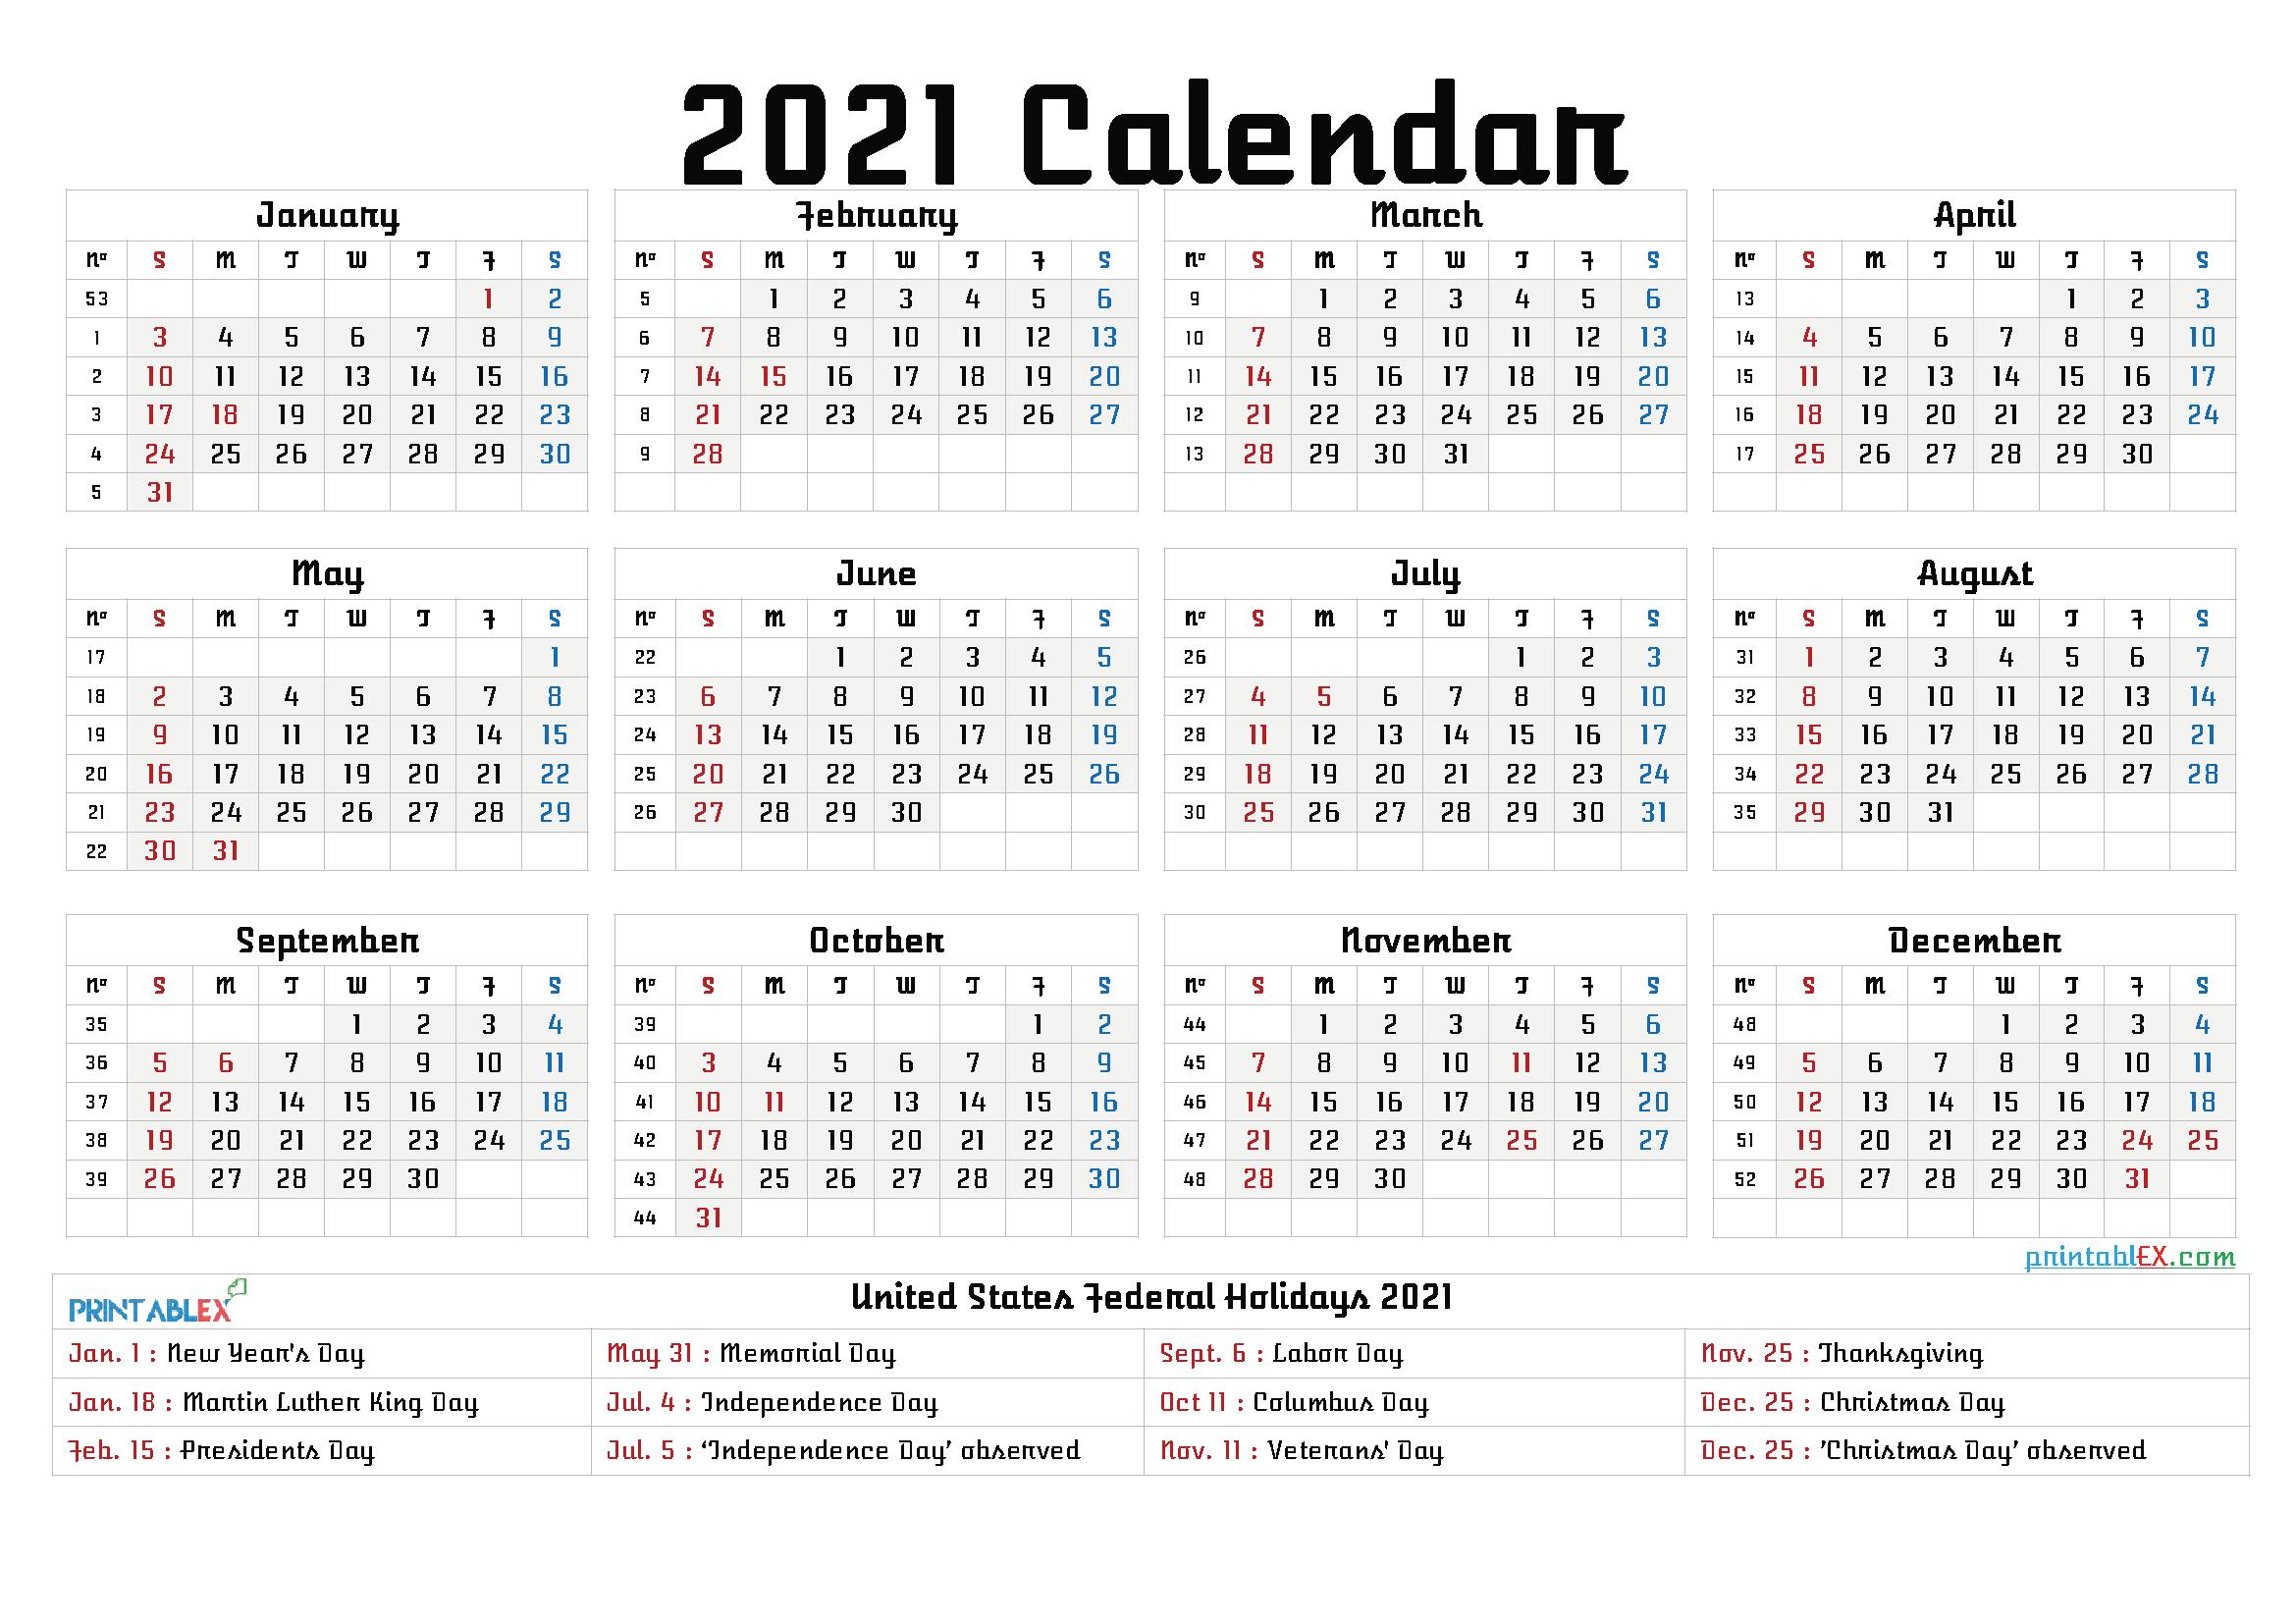 2021 Calendar Printable Free Pdf - 2021 Calendar Printable